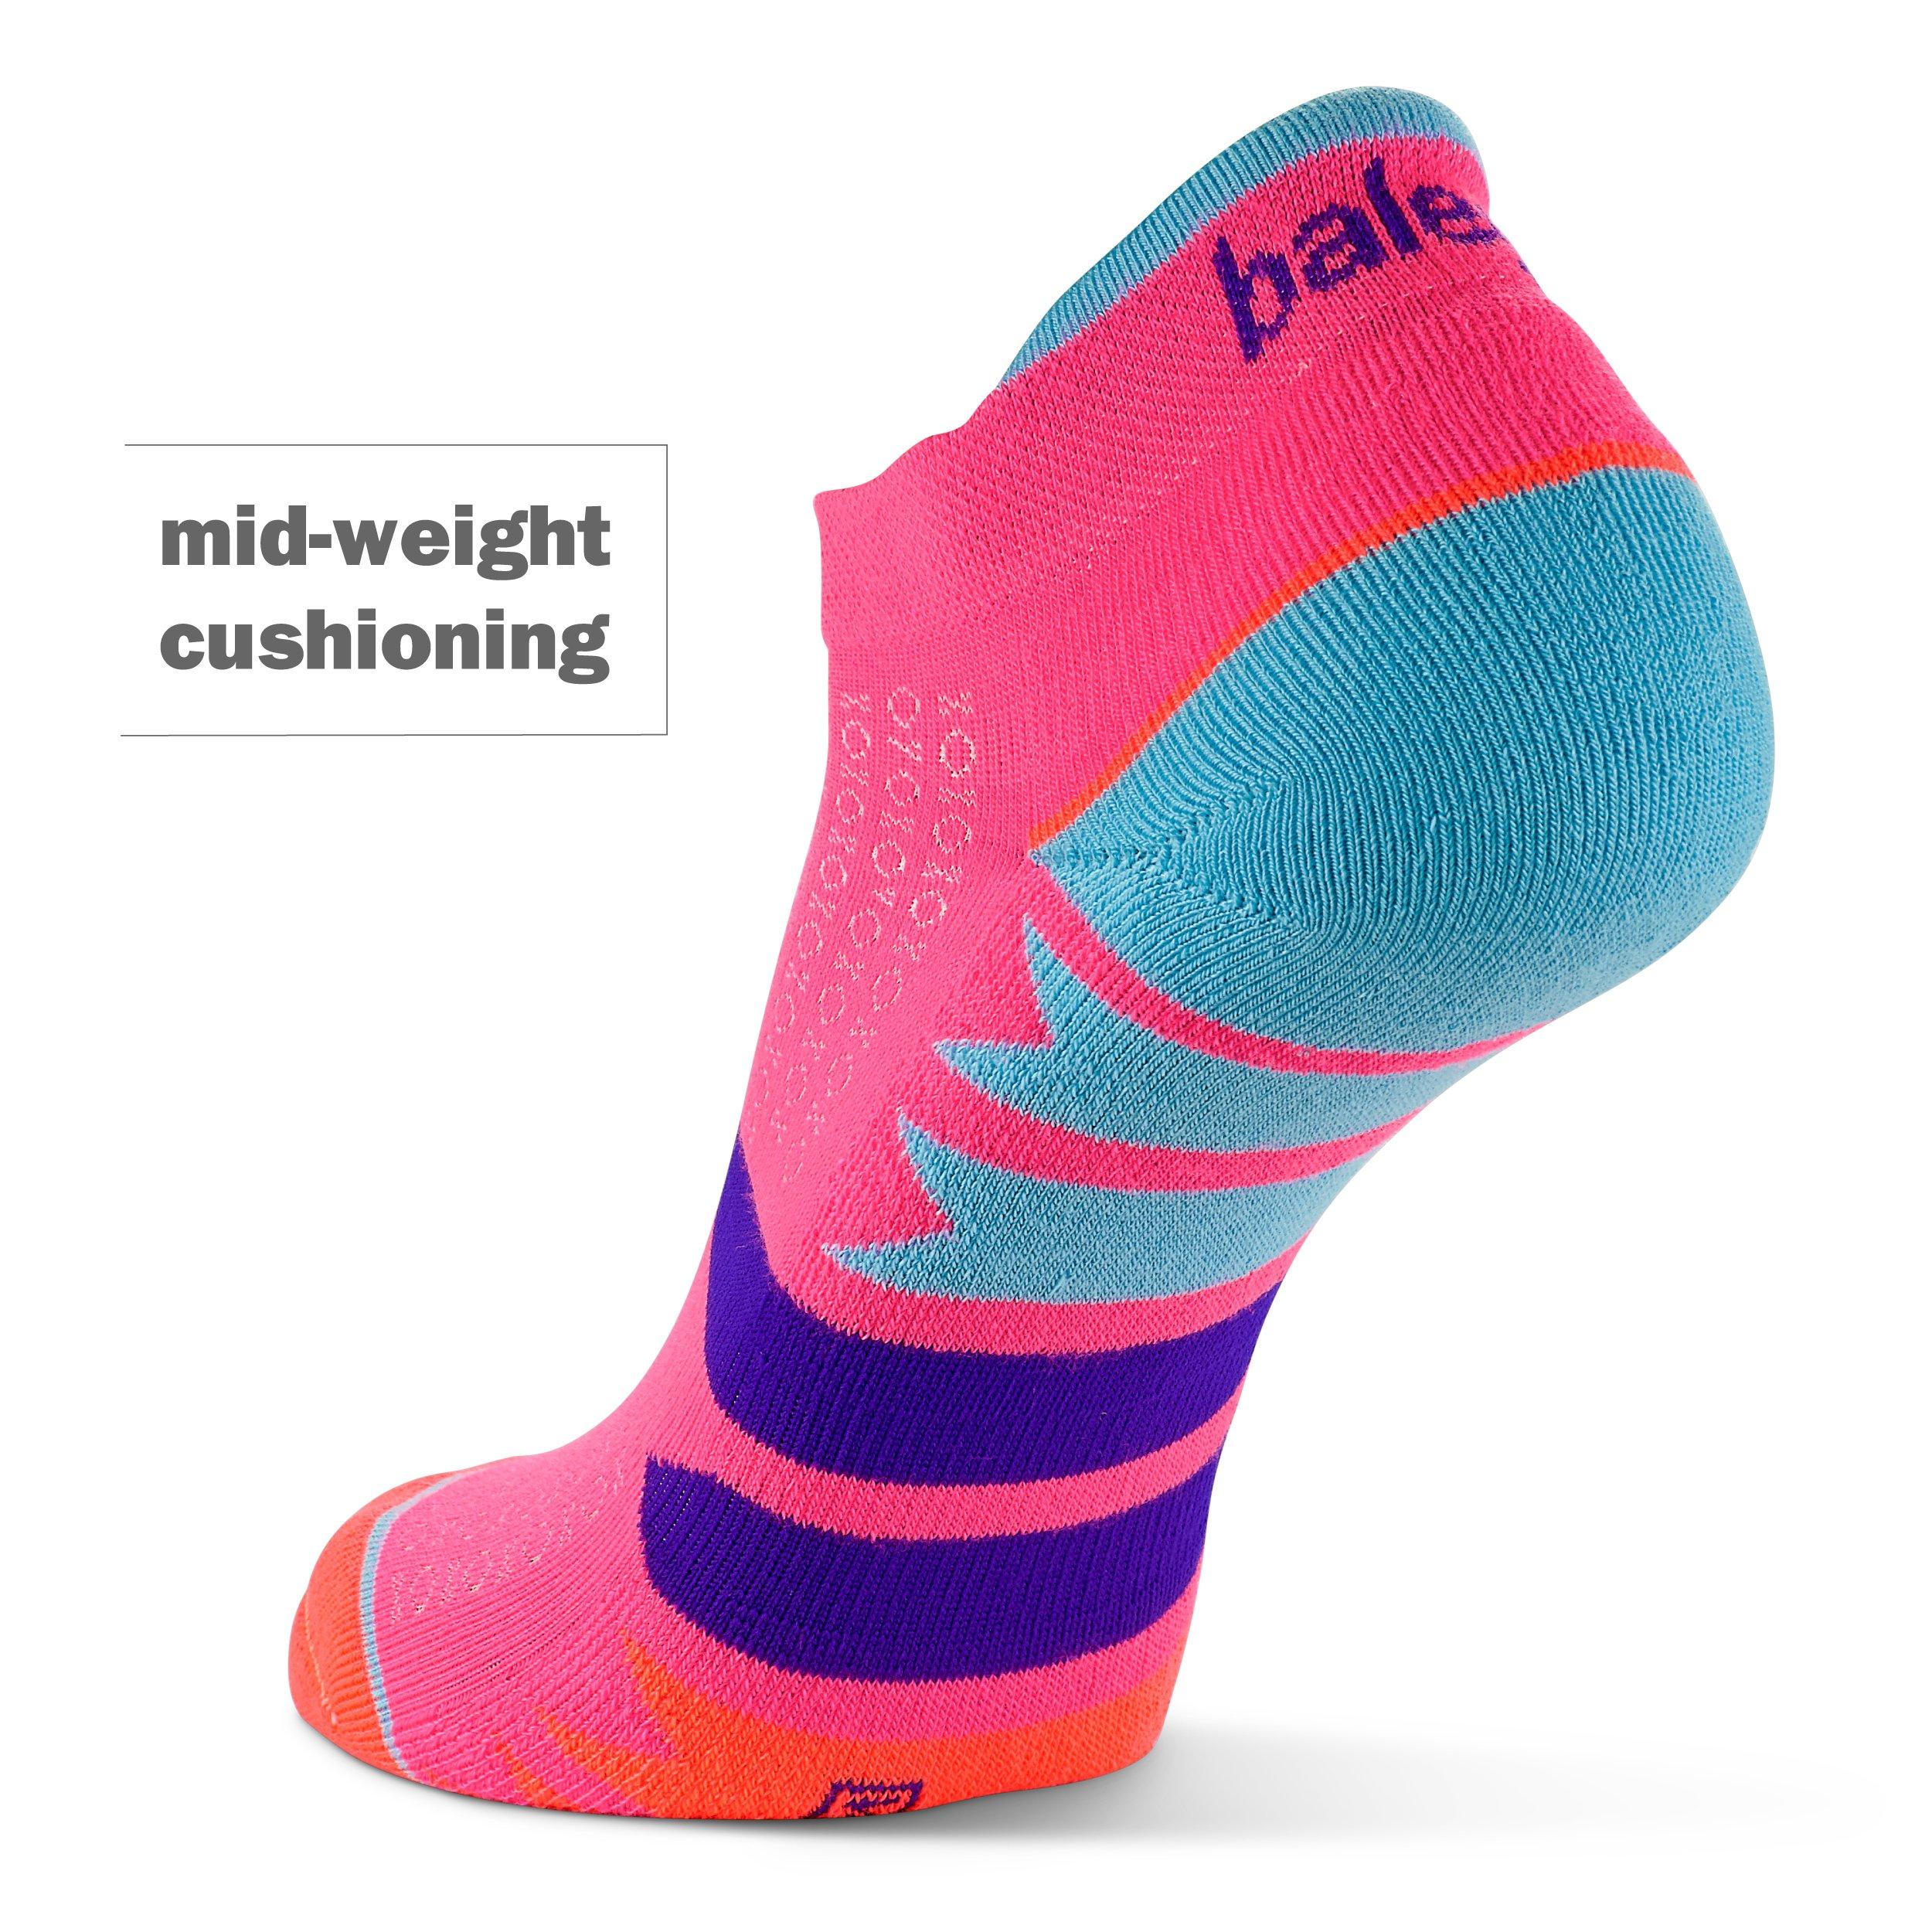 Balega Women's Enduro No Show Socks (1 Pair), Watermelon/Orange, Medium by Balega (Image #5)